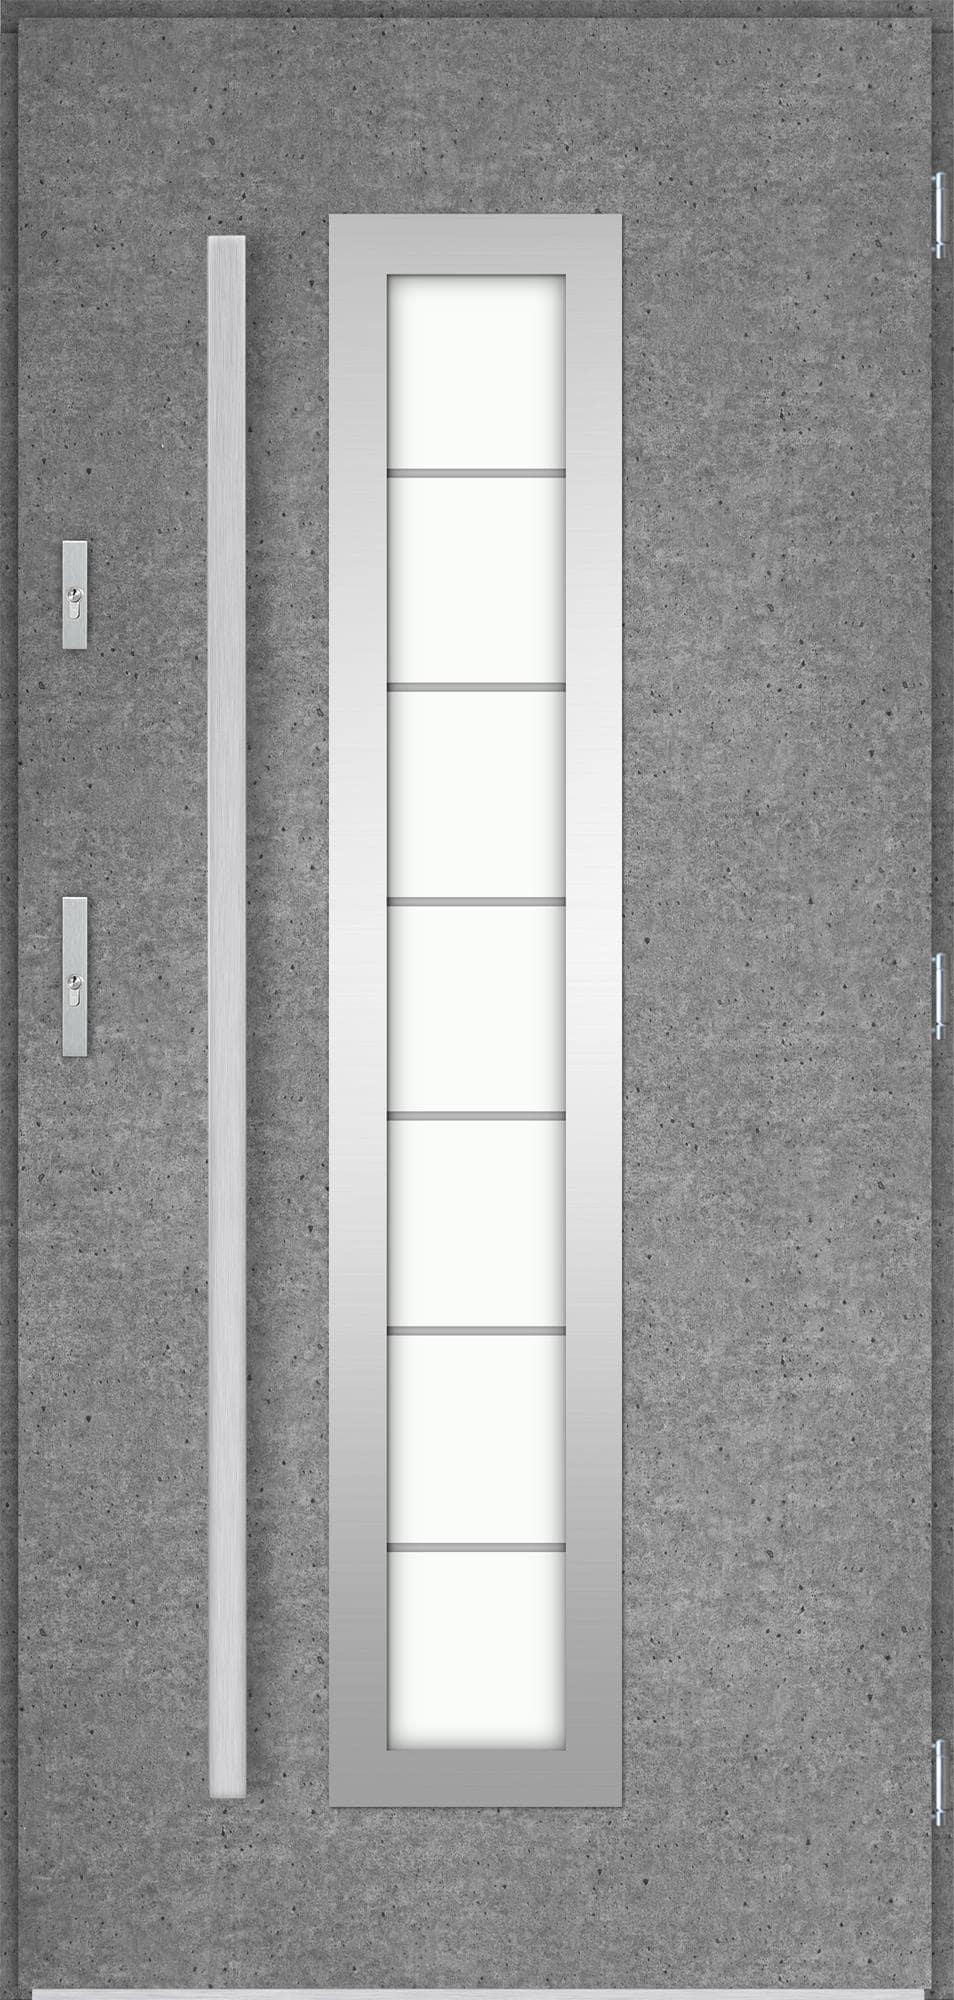 Venkovní vchodové dveøe Hevelio, beton